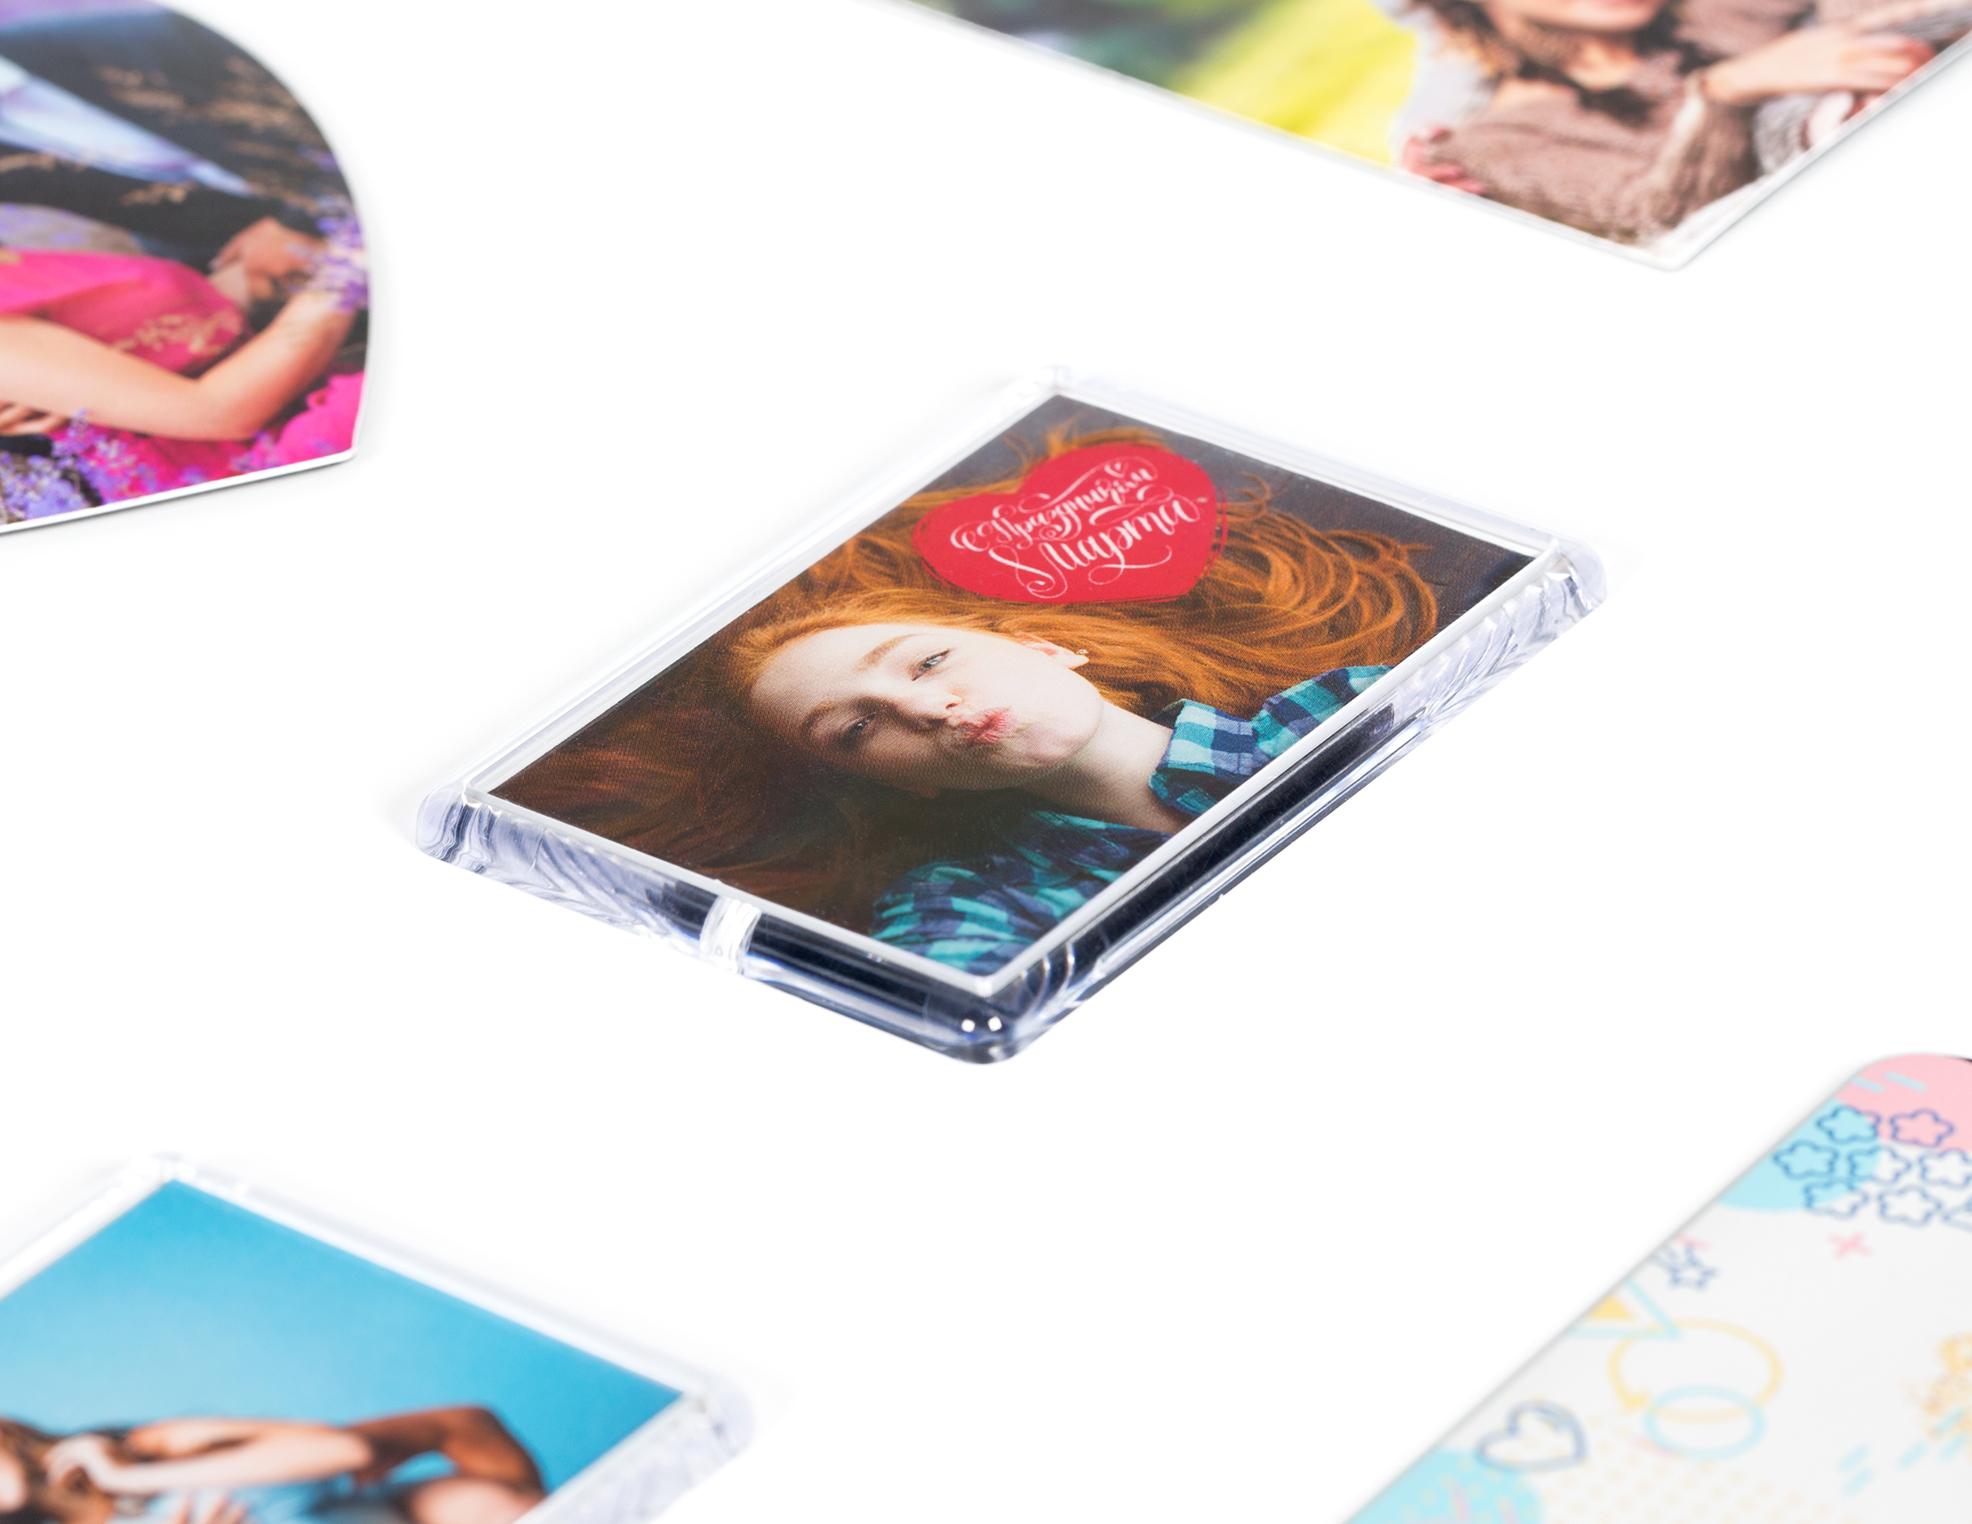 Печать фото на магнитах – изготовление на заказ в NetPrint